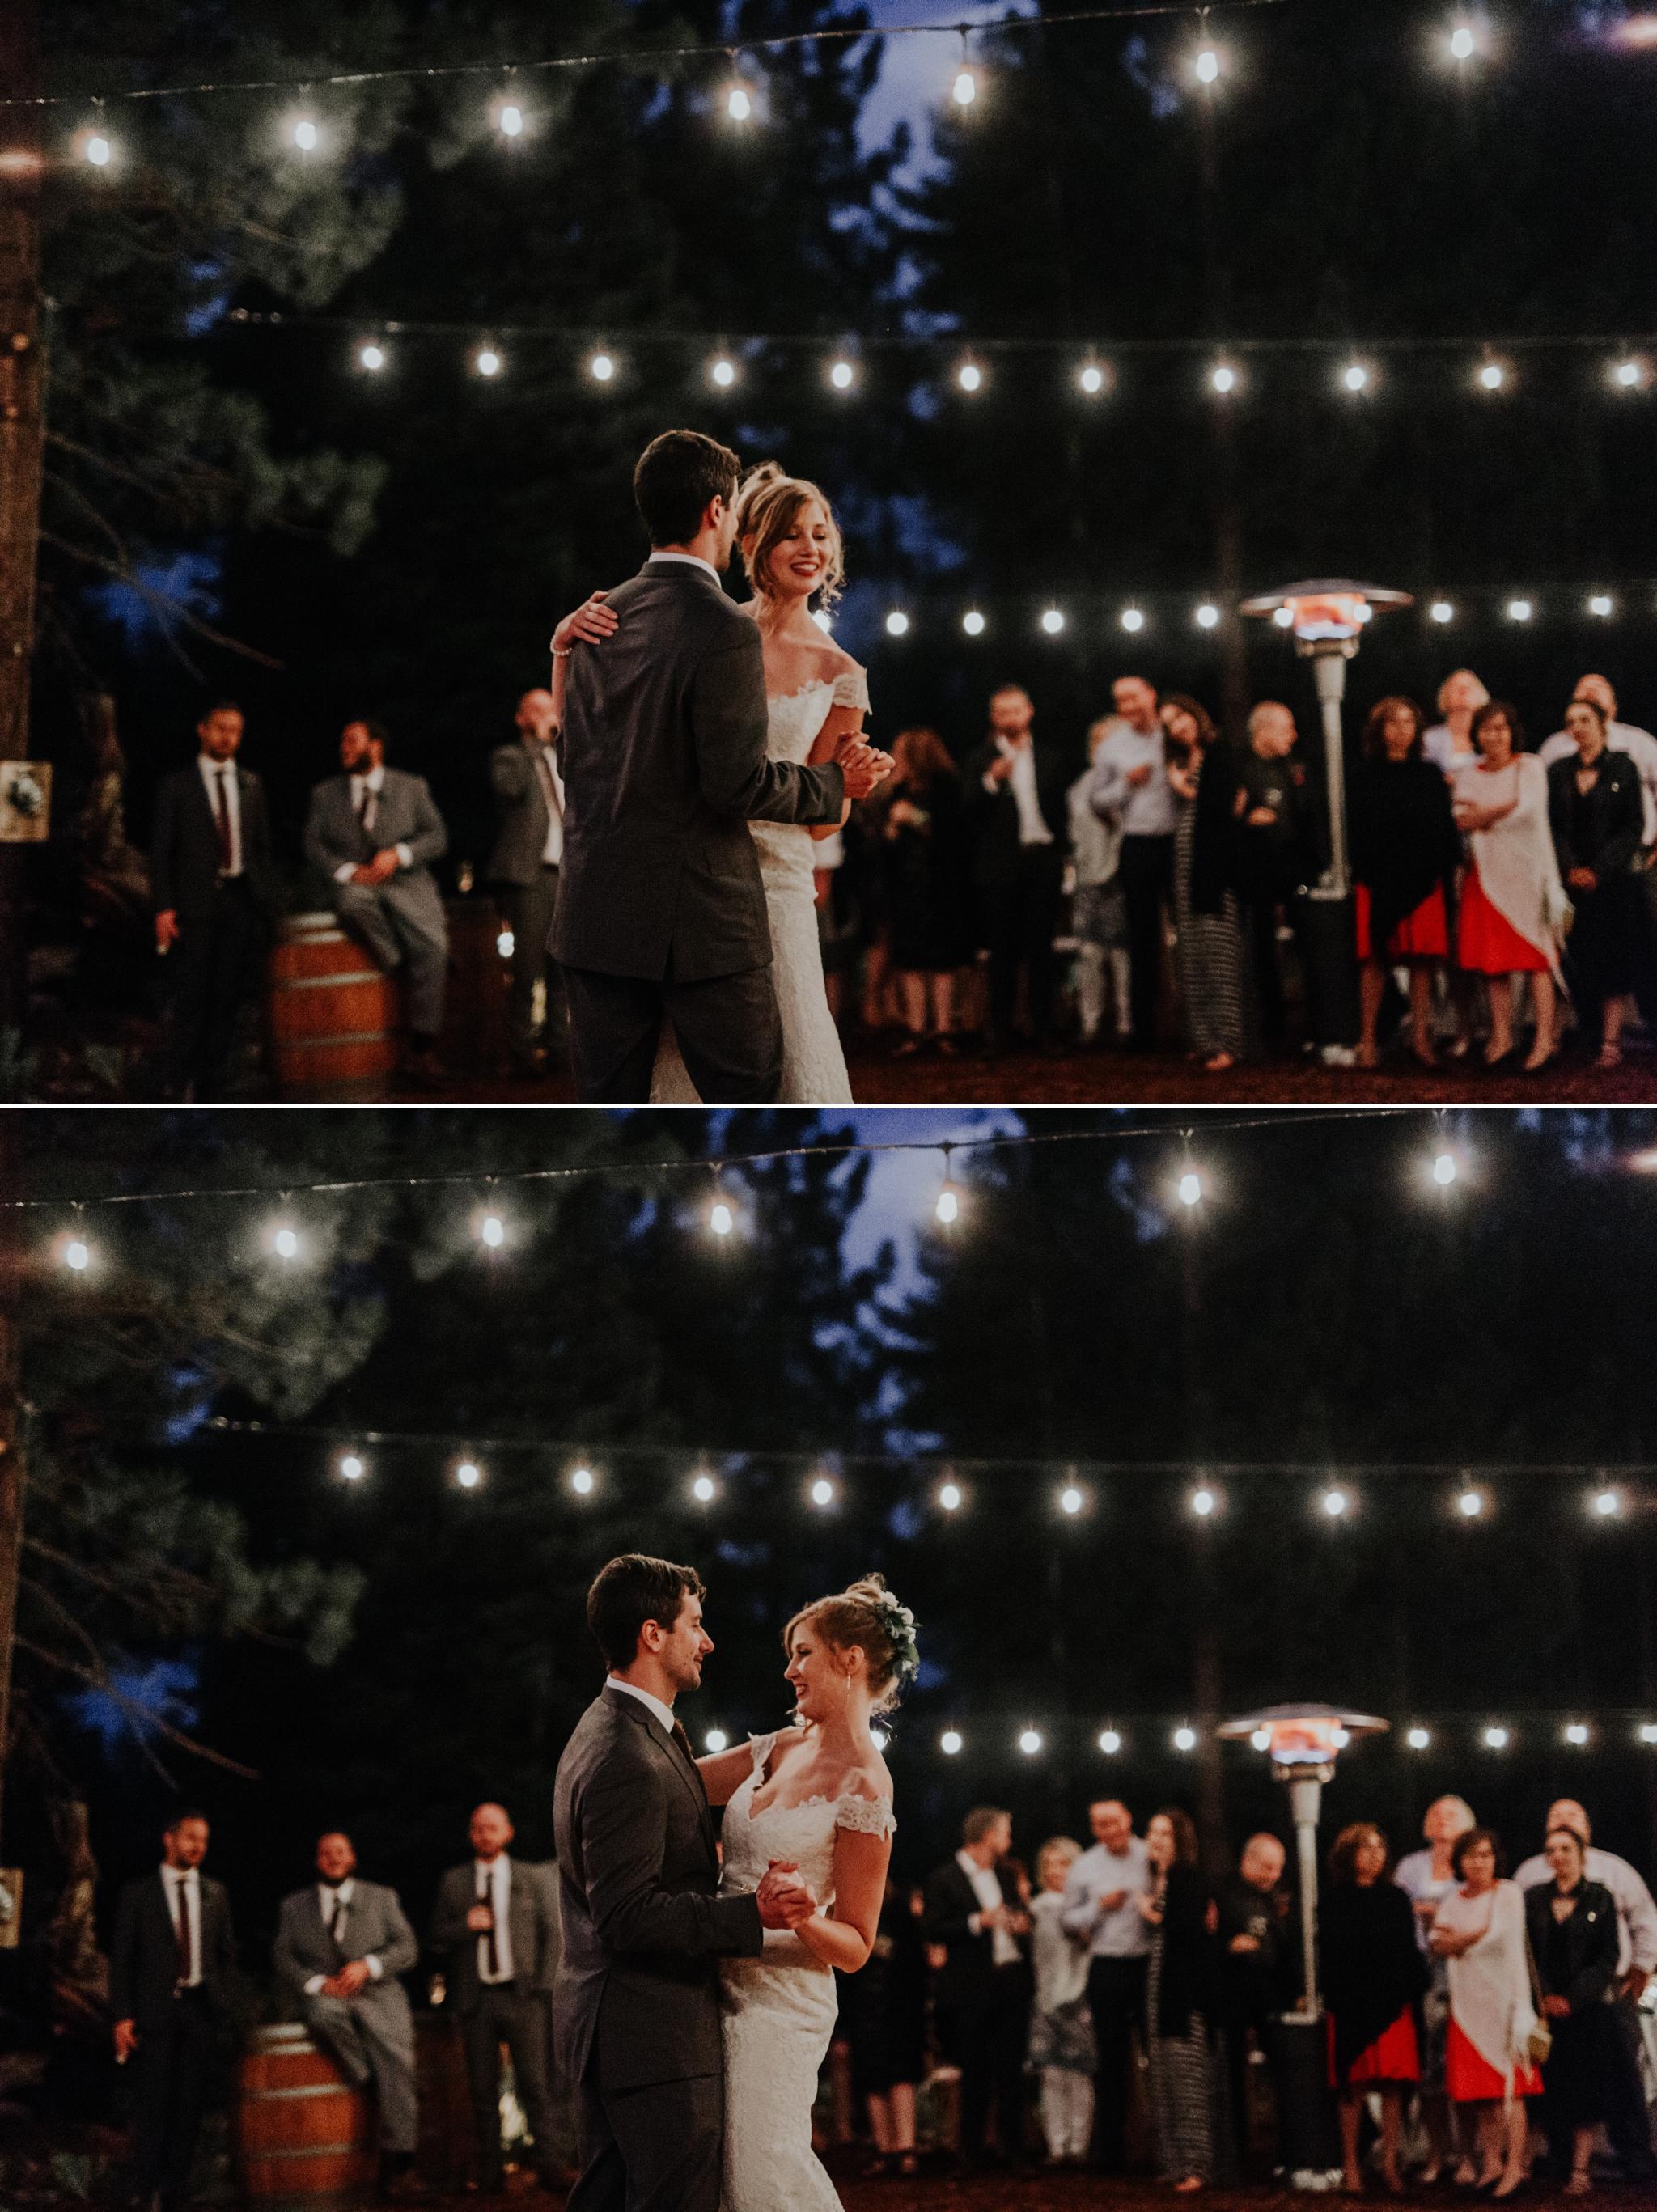 tahoe-wedding-photographer25.jpg